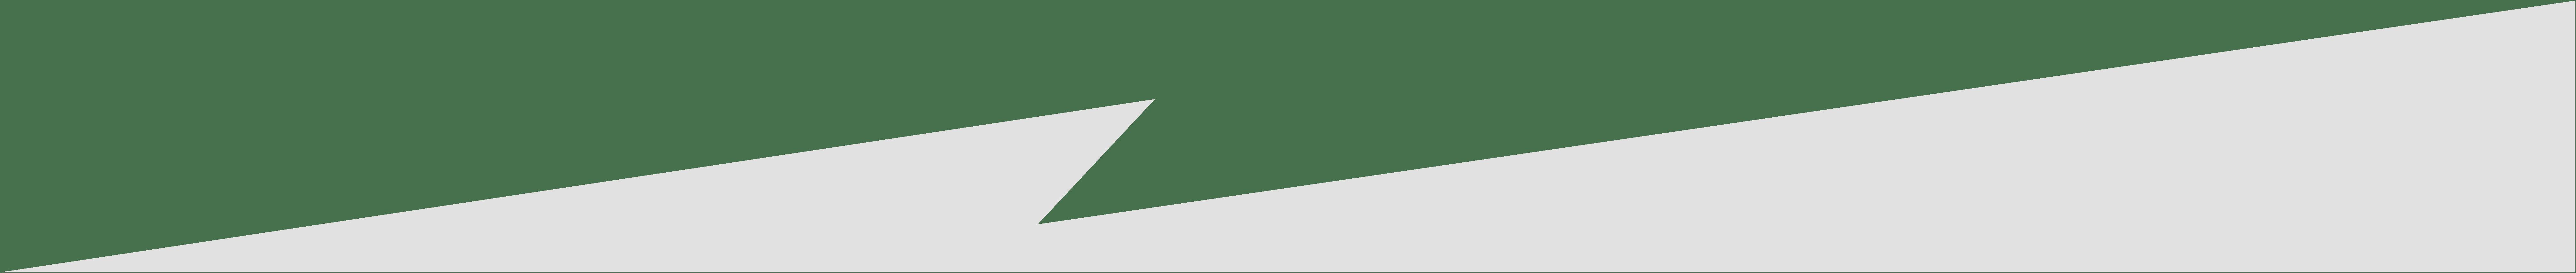 Bolt-divider-E1-png